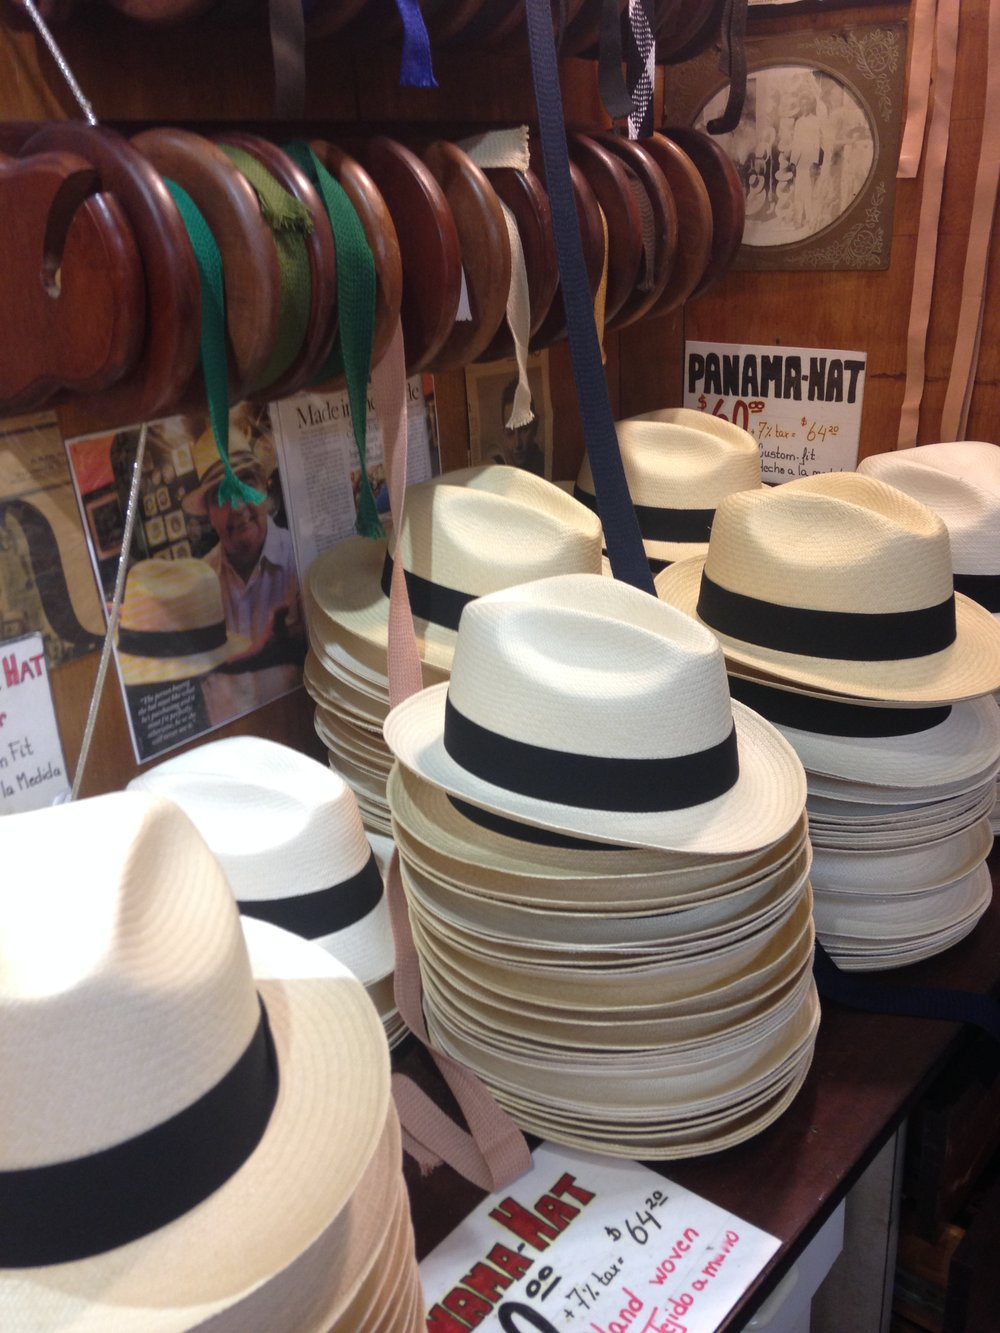 Shopping for Panama hats at Ole Curiosidades. So many ribbon options!